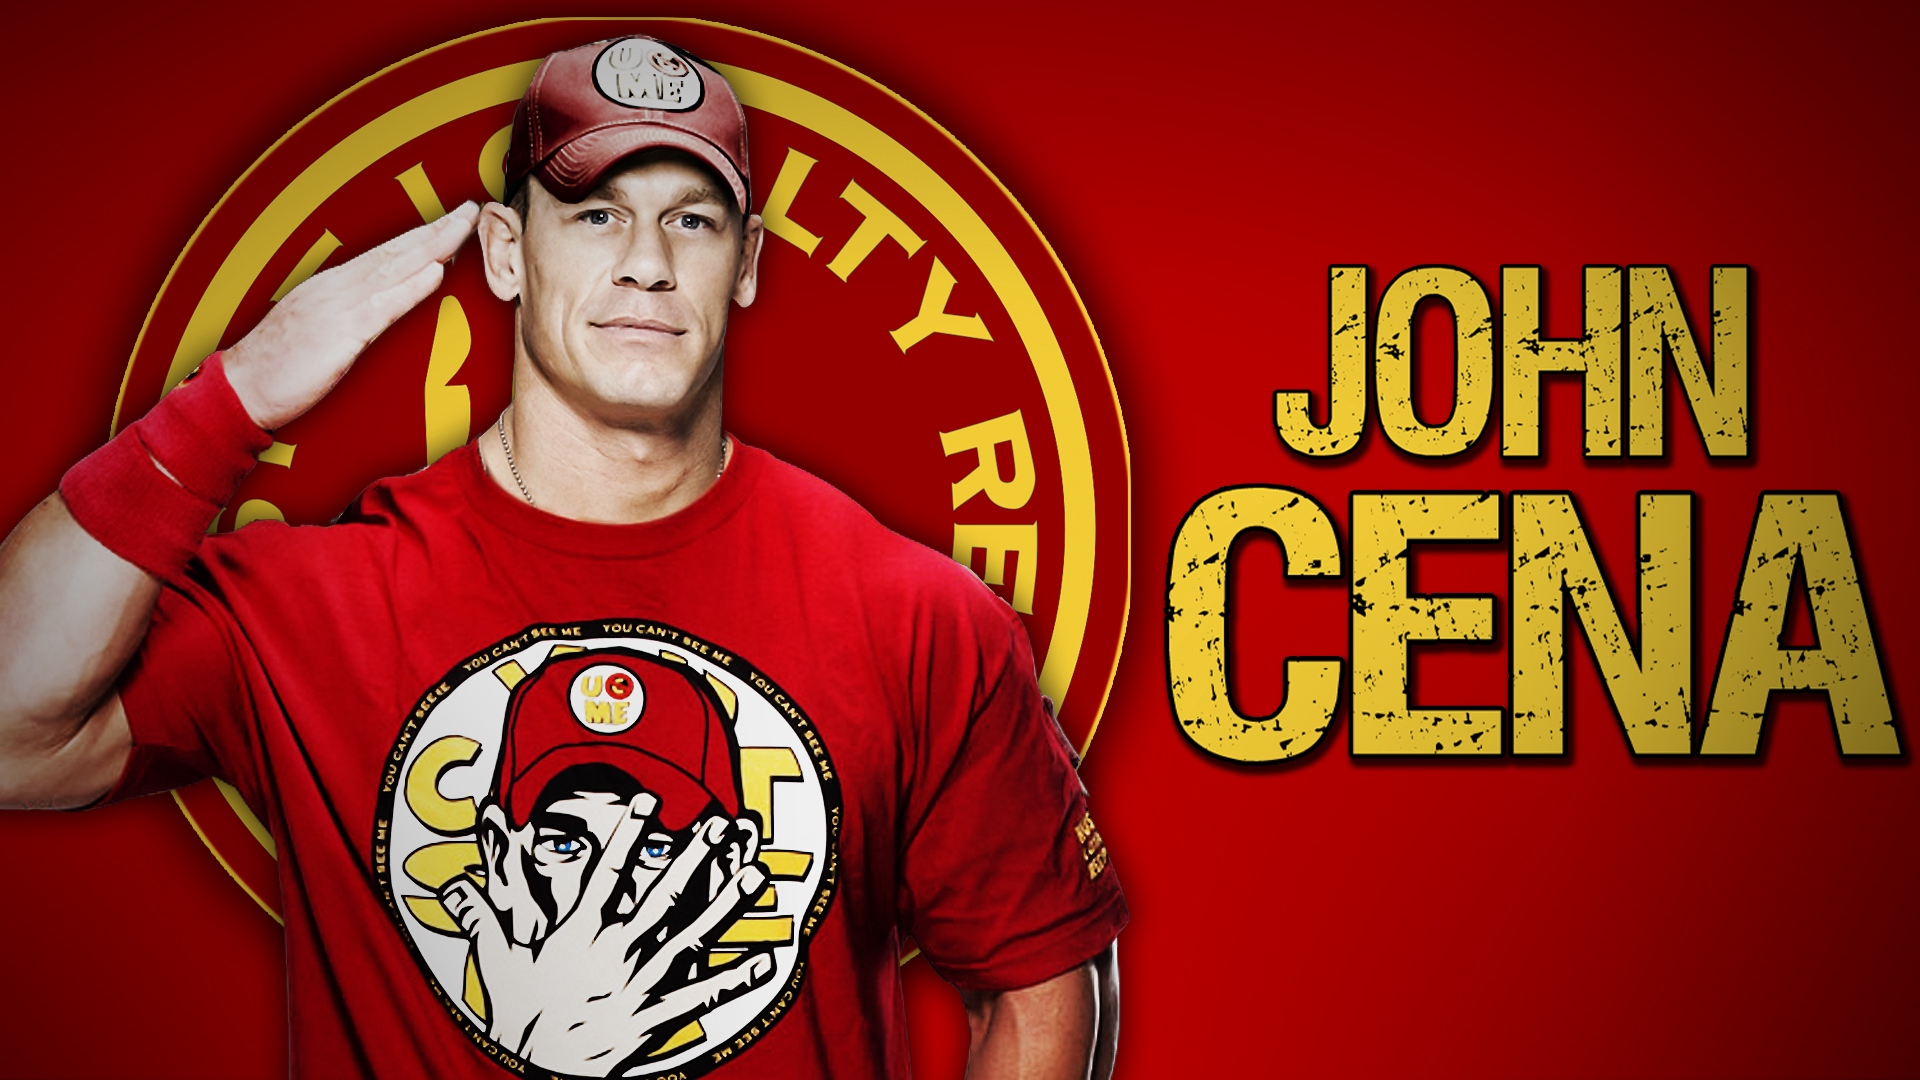 Wallpaper of John Cena Wrestler Rapper Actor WWE background 1920x1080